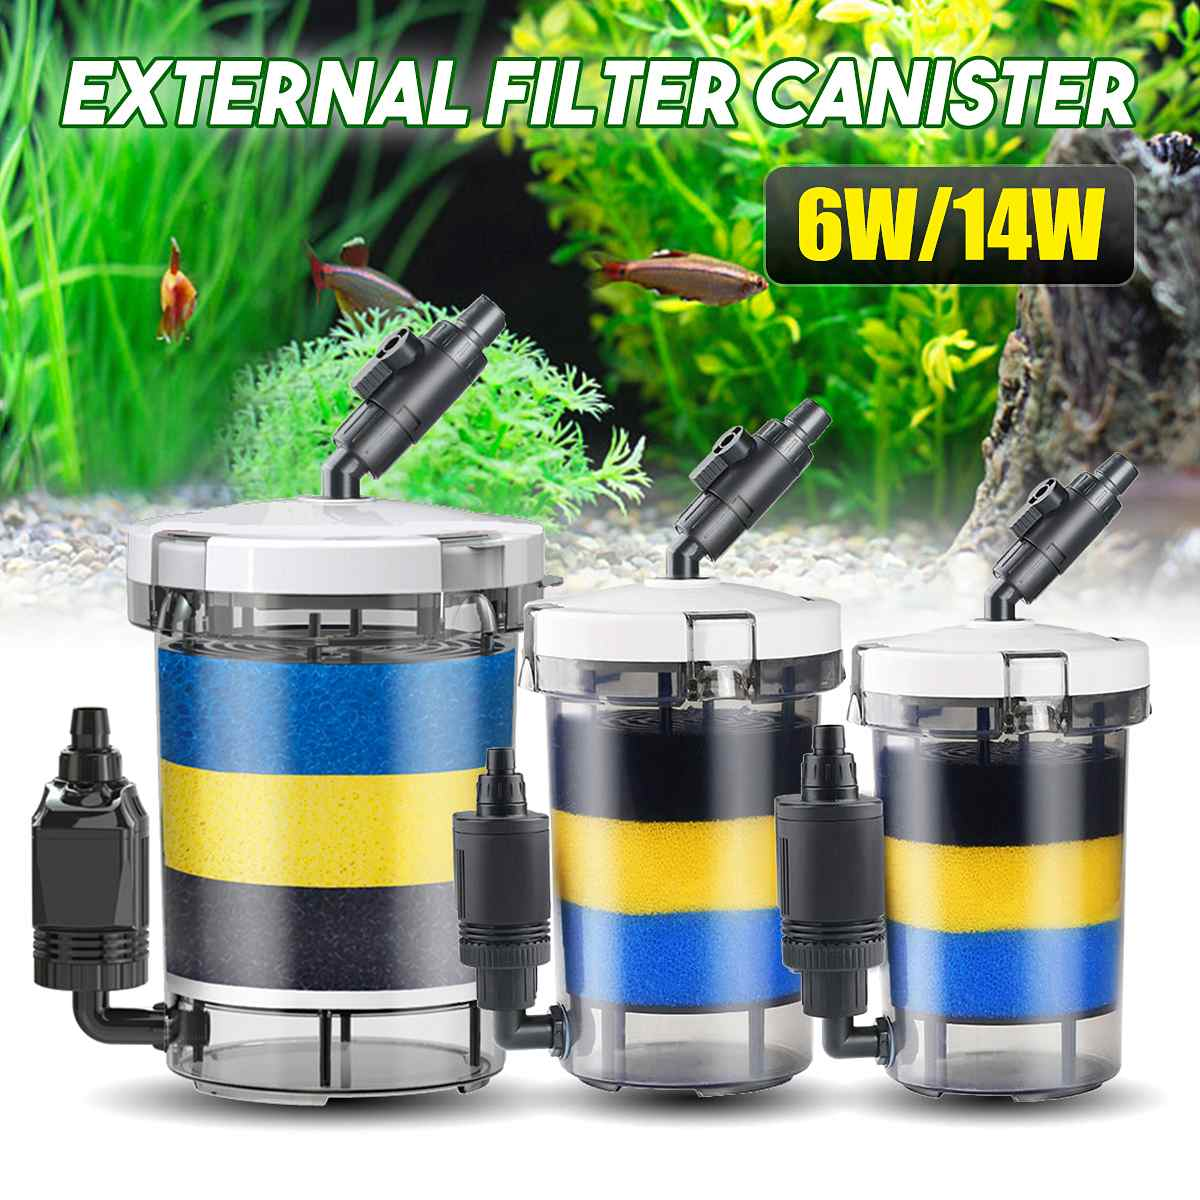 220V Aquarium External Canister Filter Fish Water Tank Air Pump Sponge Pond Water Fish Tank Filter Pump Aquarium Purifier